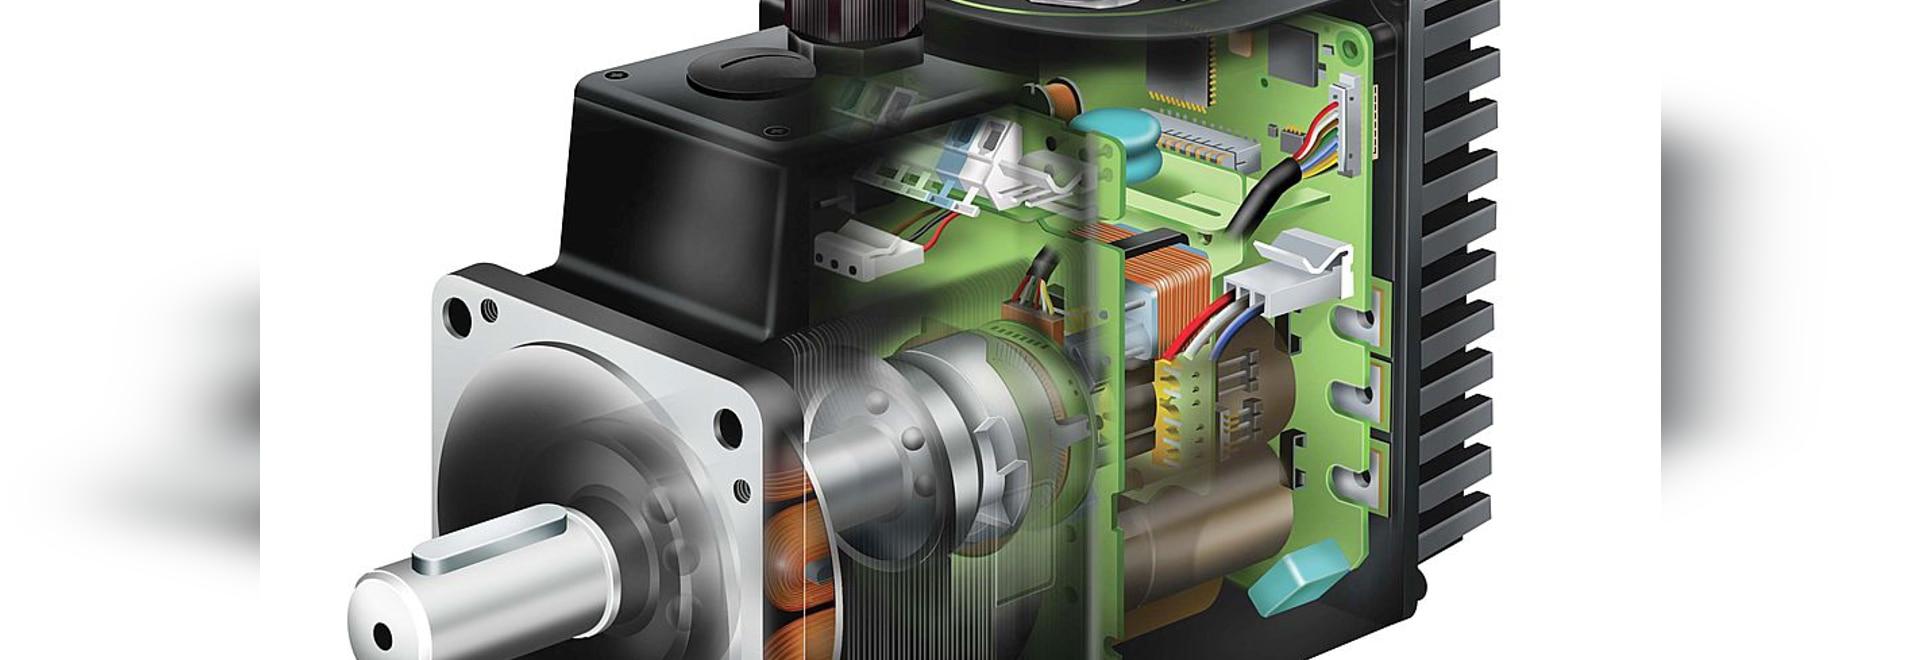 World leader in integrated servo and stepper motors.